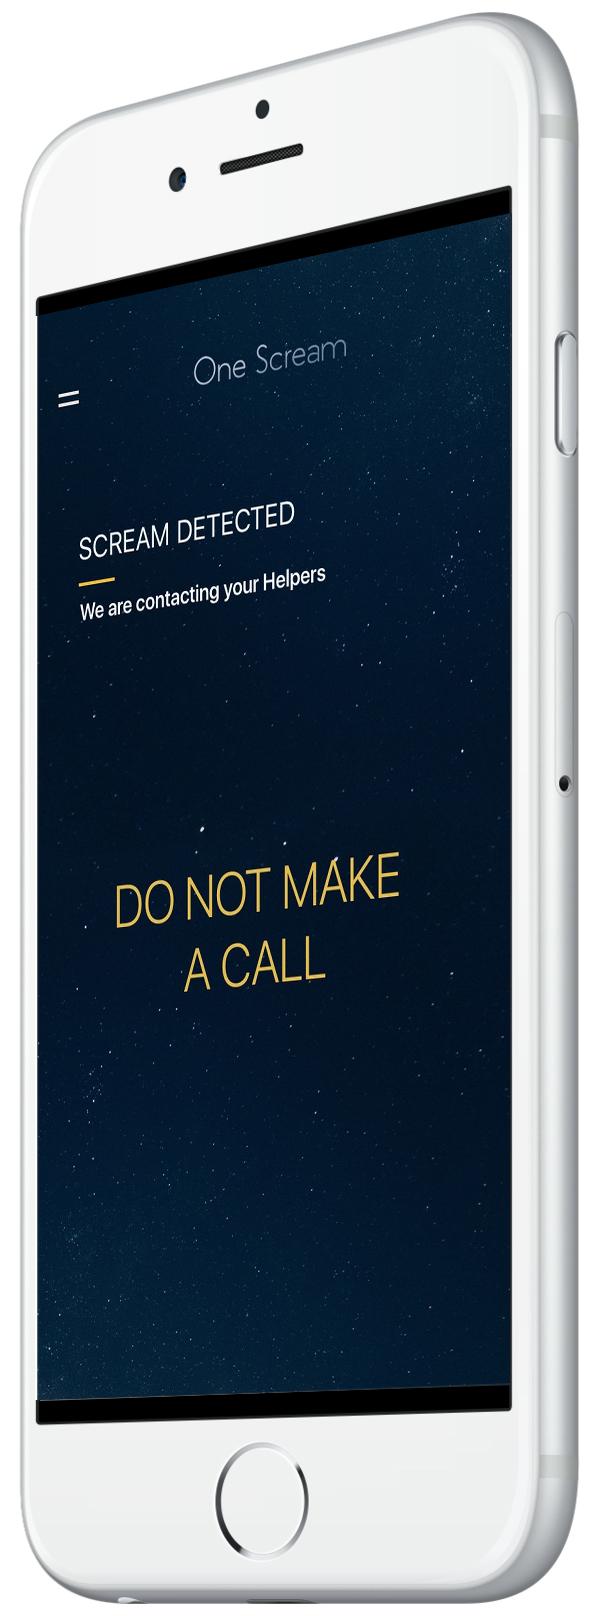 OneScream_safeguarding_app_panic_scream_detected_safety_alert_activated.jpg